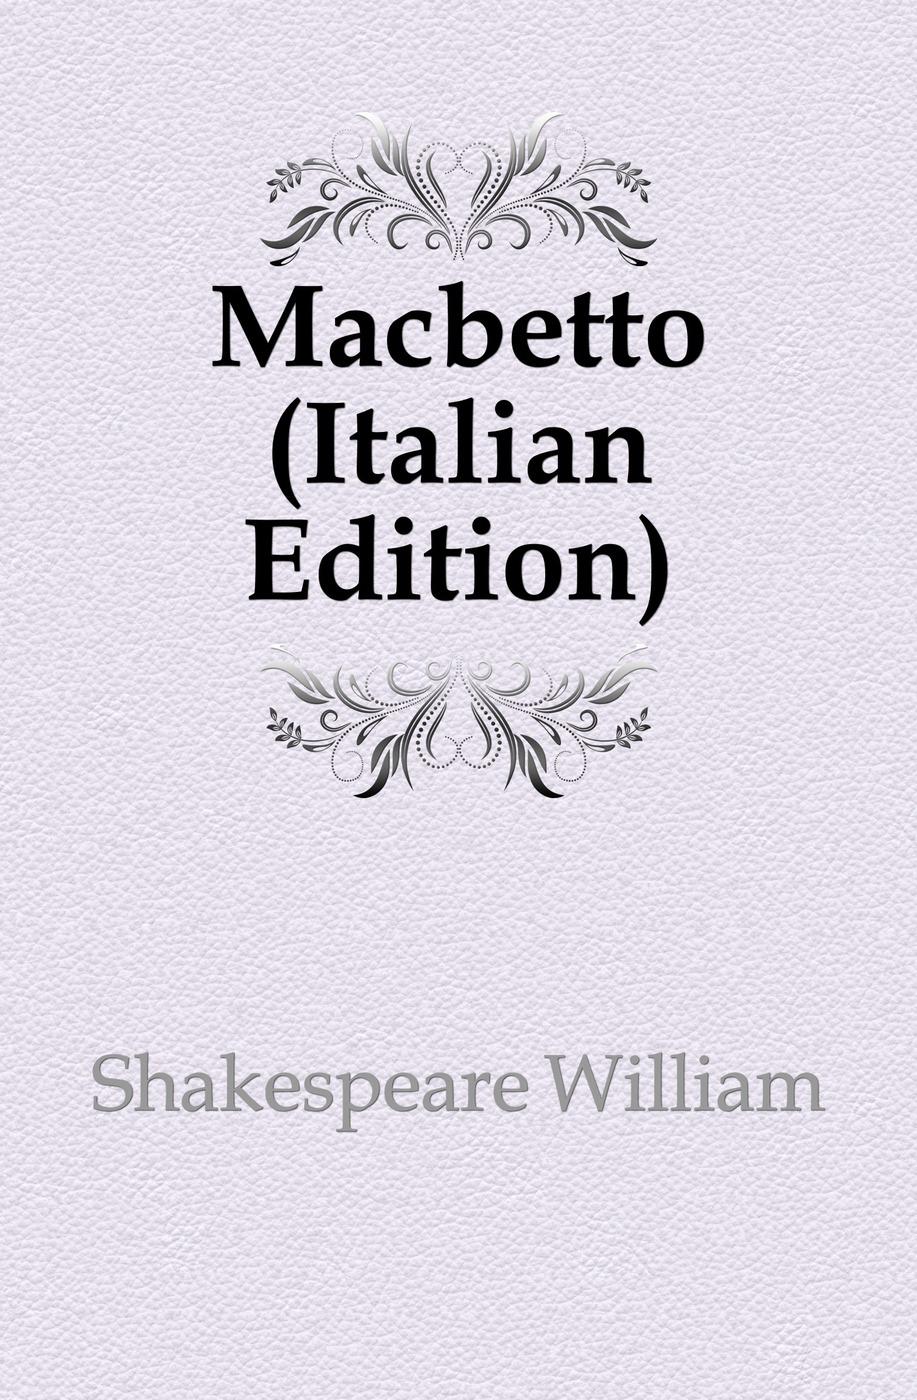 Уильям Шекспир Macbetto (Italian Edition)